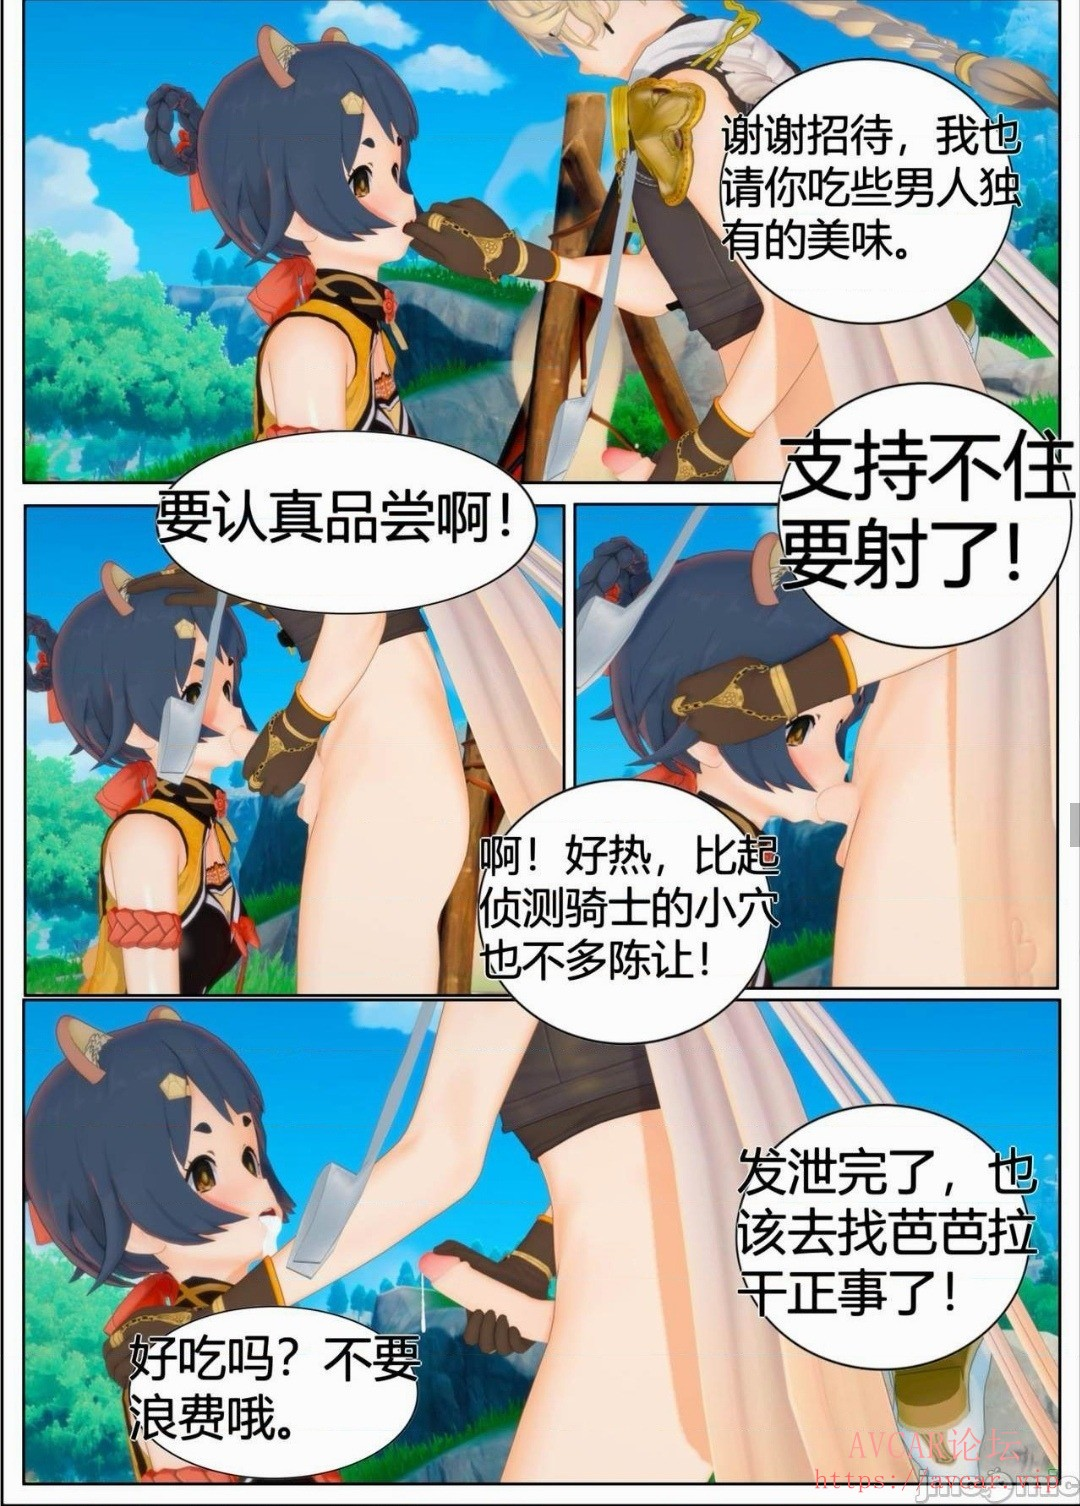 Screenshot_20210914_033208_com.new_comic18_edit_962452326501578.jpg